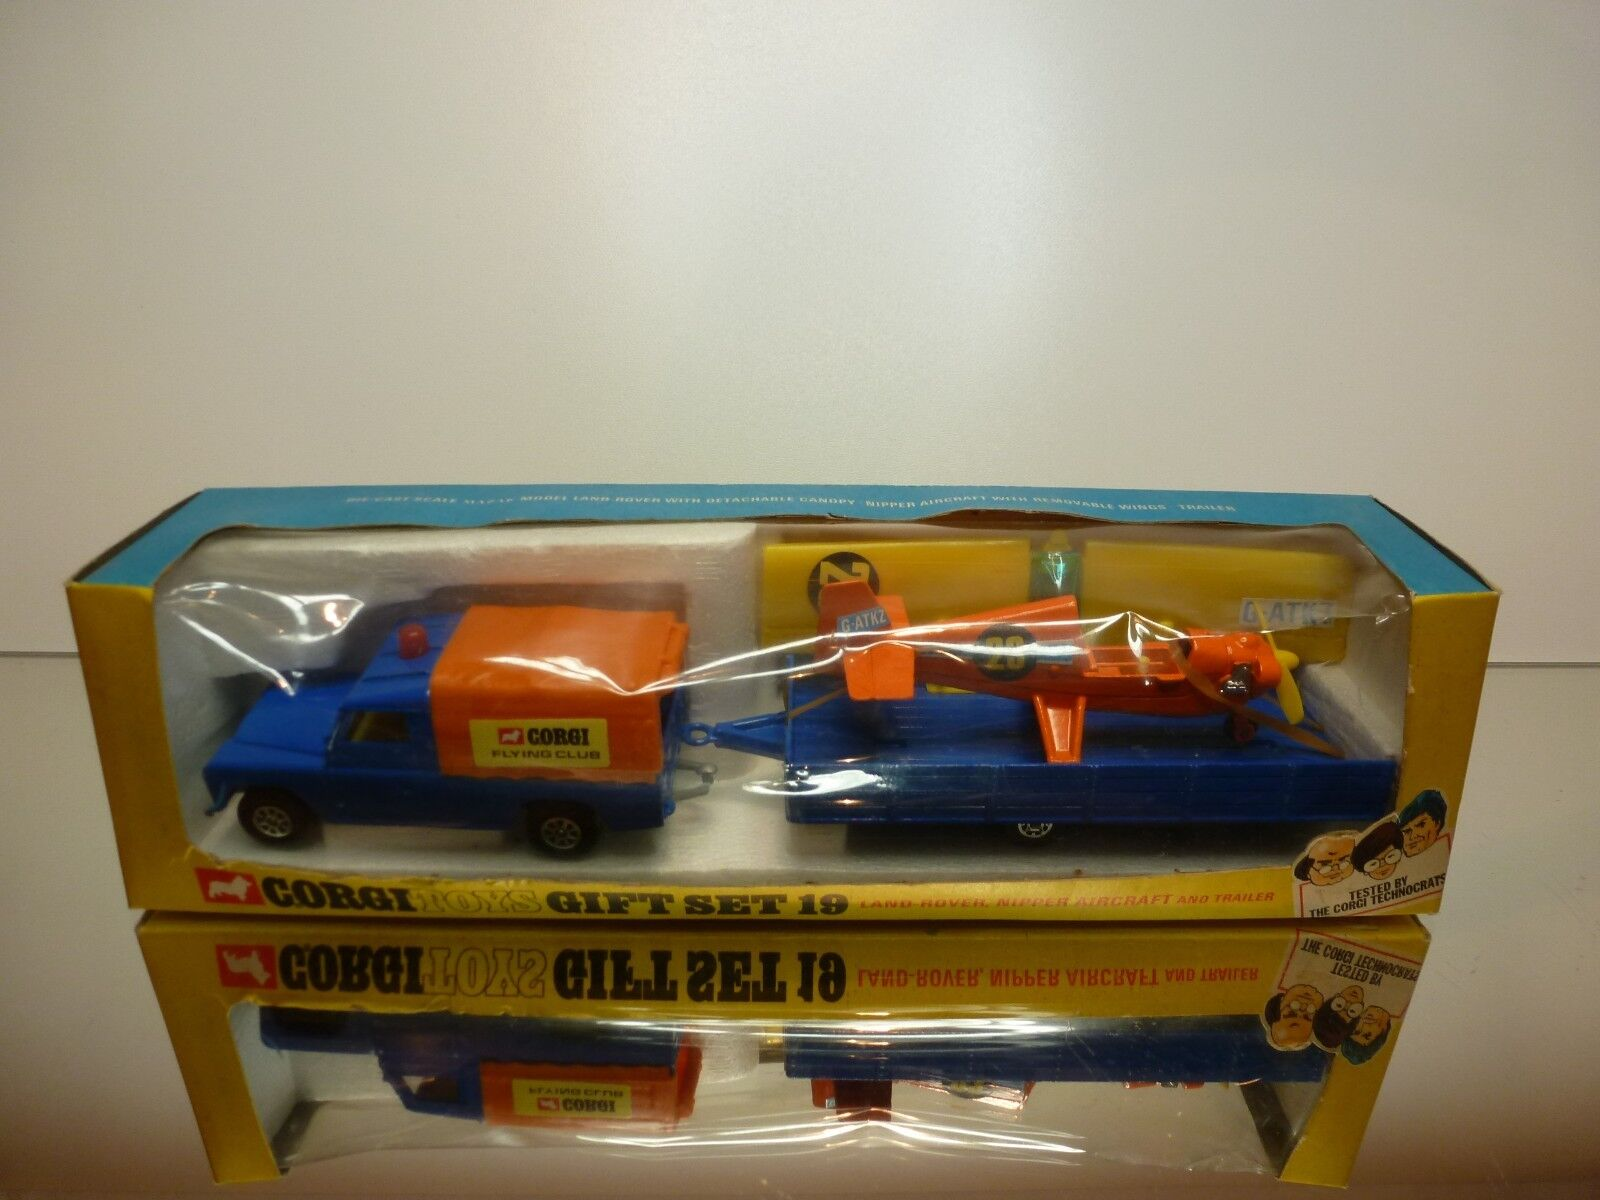 CORGI TOYS GIFT SET 19 LAND ROVER NIPPER AIRCRAFT - bleu 1 43 - VERY GOOD IN BOX